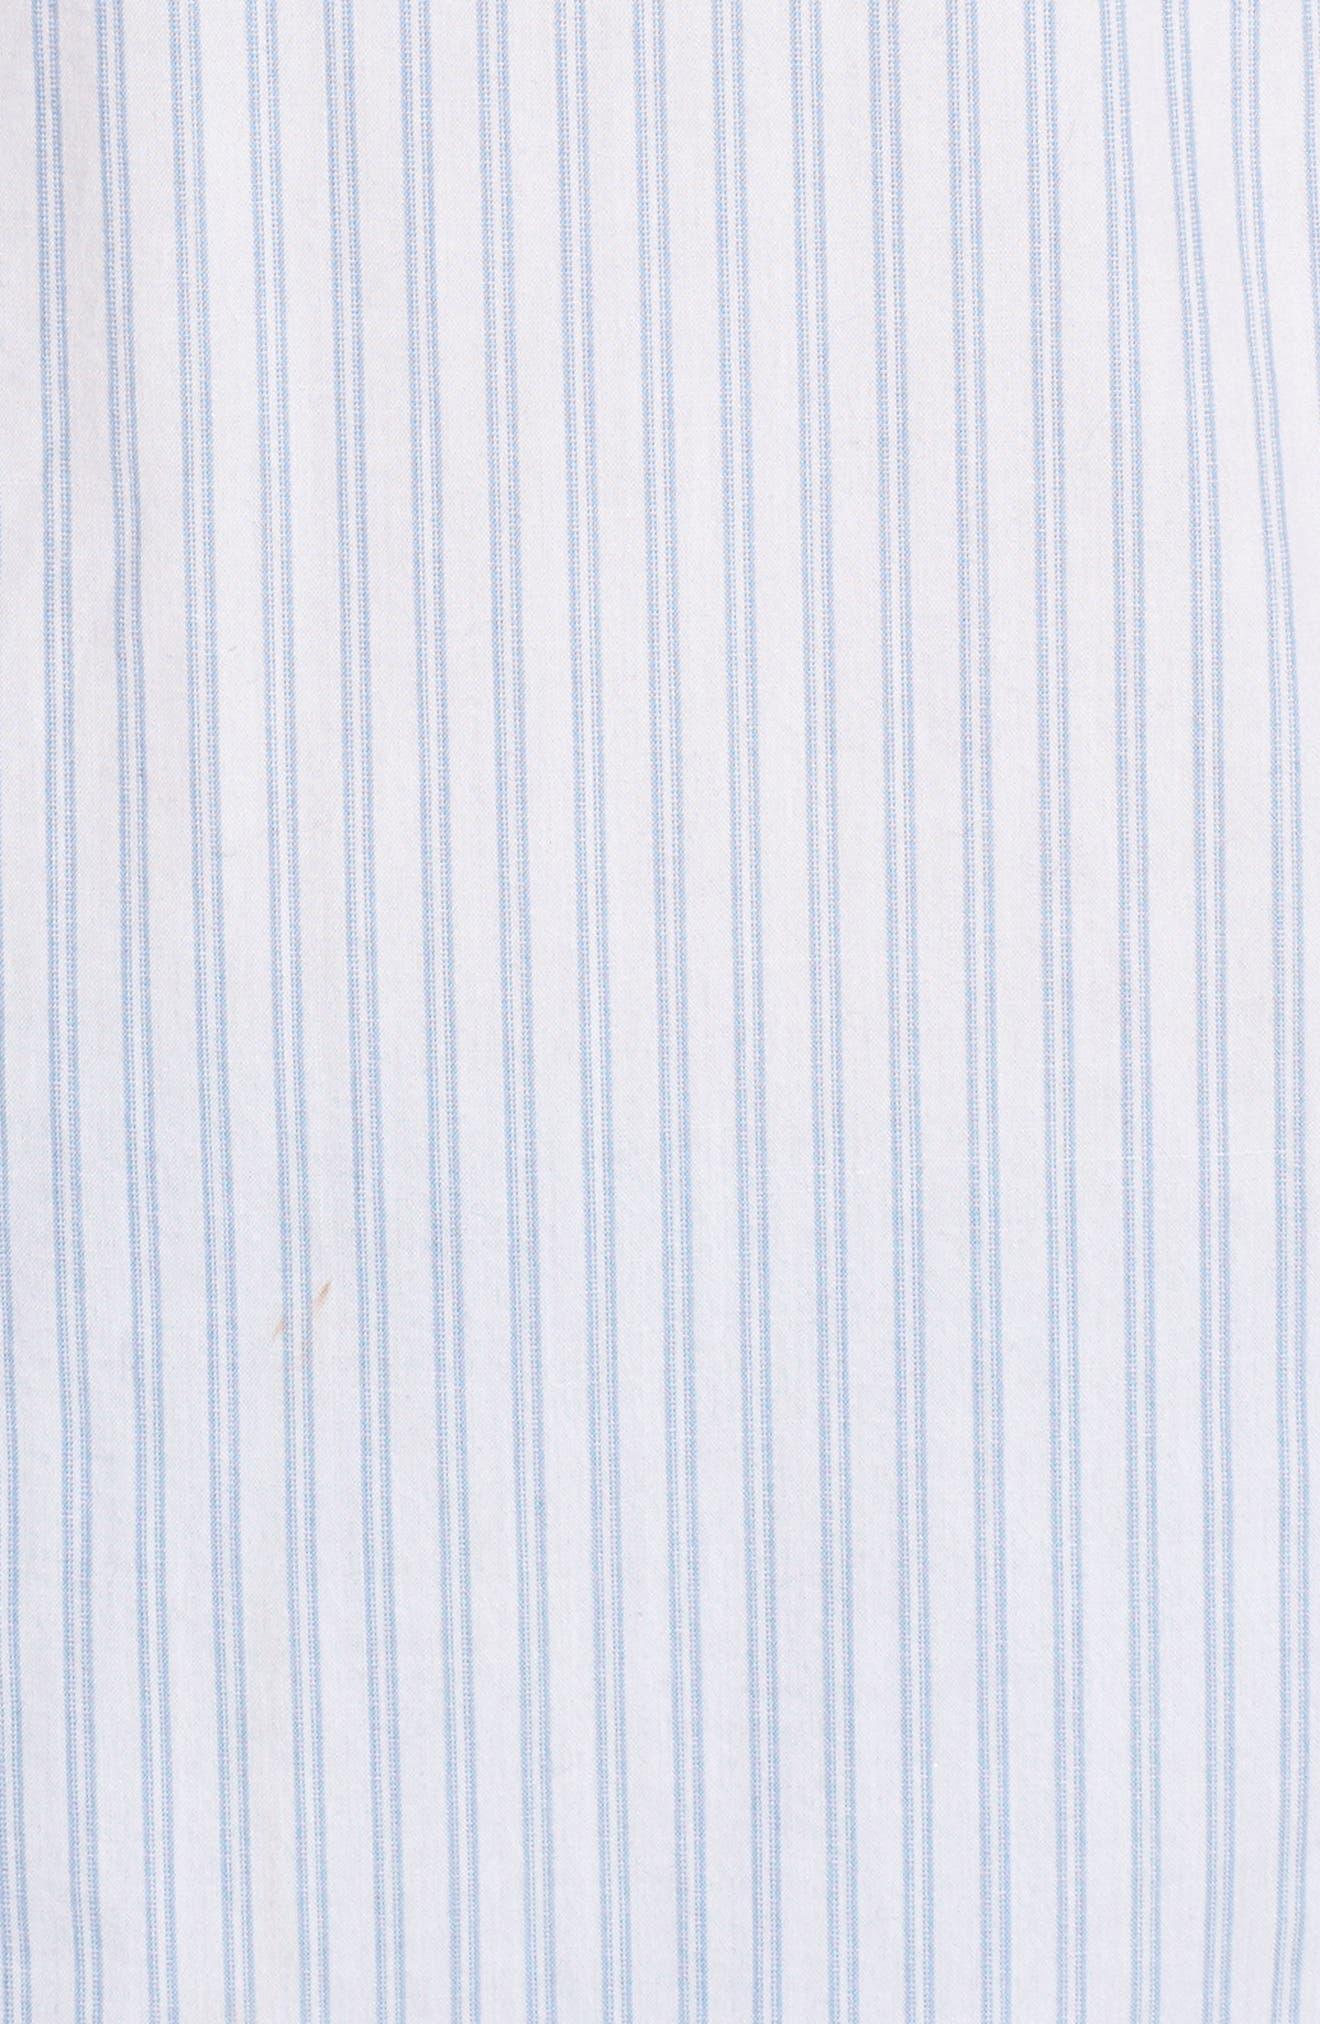 Button Front Pocket Shirt,                             Alternate thumbnail 5, color,                             White- Blue Stripe